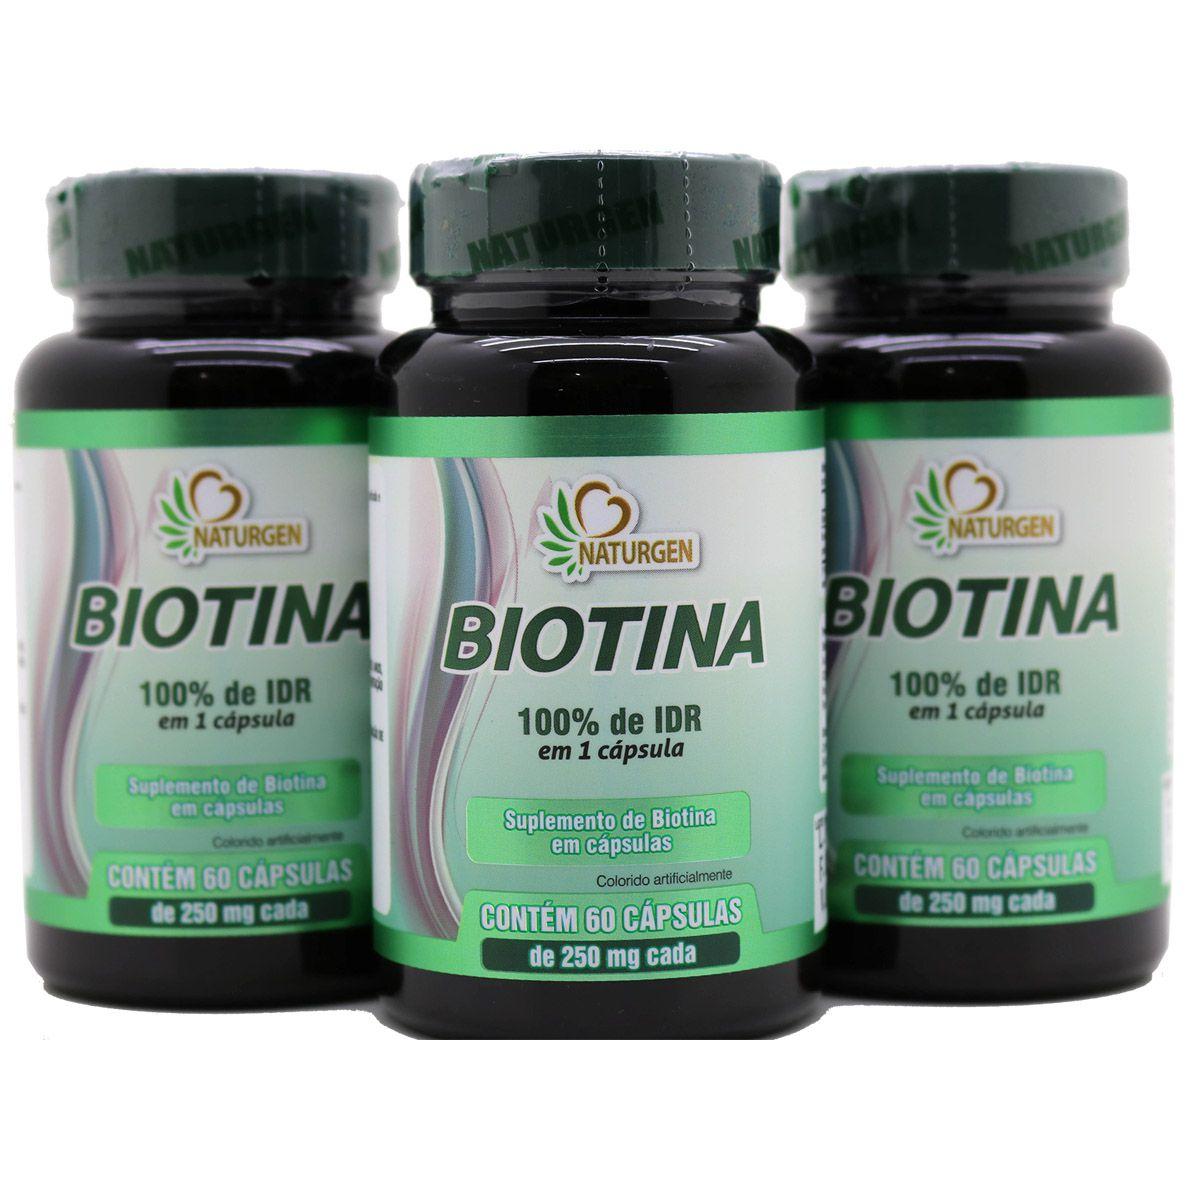 3x Biotina 60 Capsulas 6 Meses Vitamina H Vitamina B7 Crescimento Firmeza